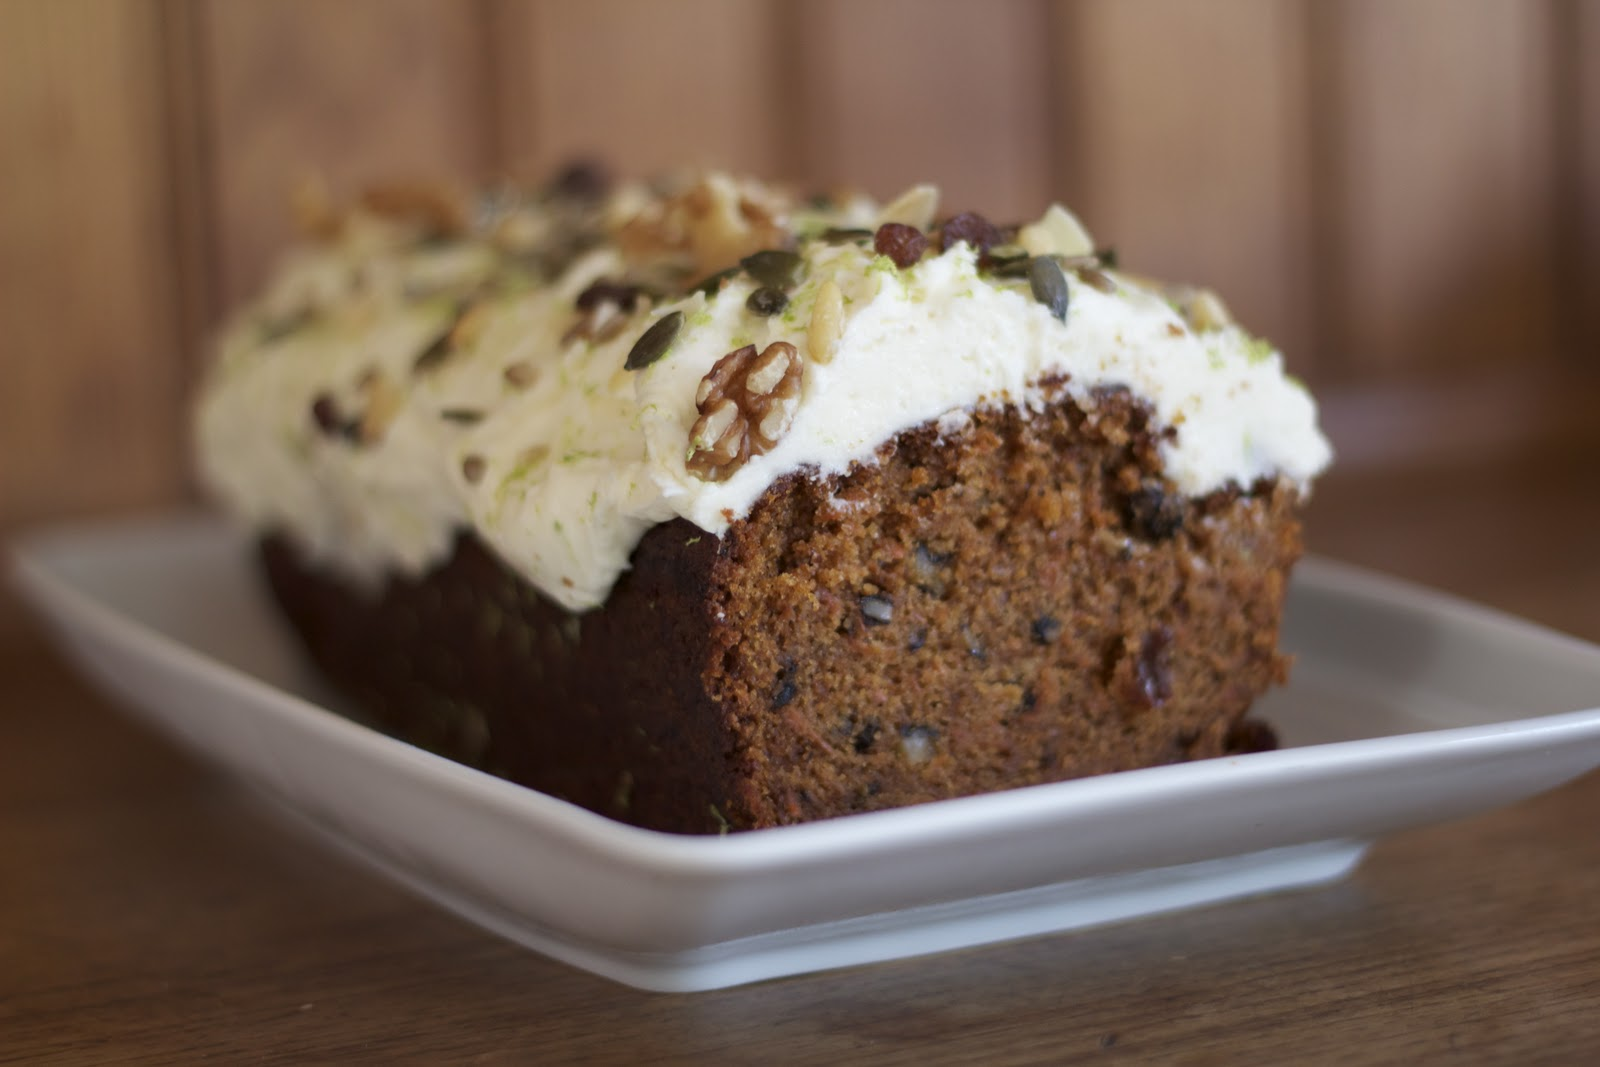 Carrot Cake Recipe Uk No Nuts: Milli's Kitchen: Carrot Cake